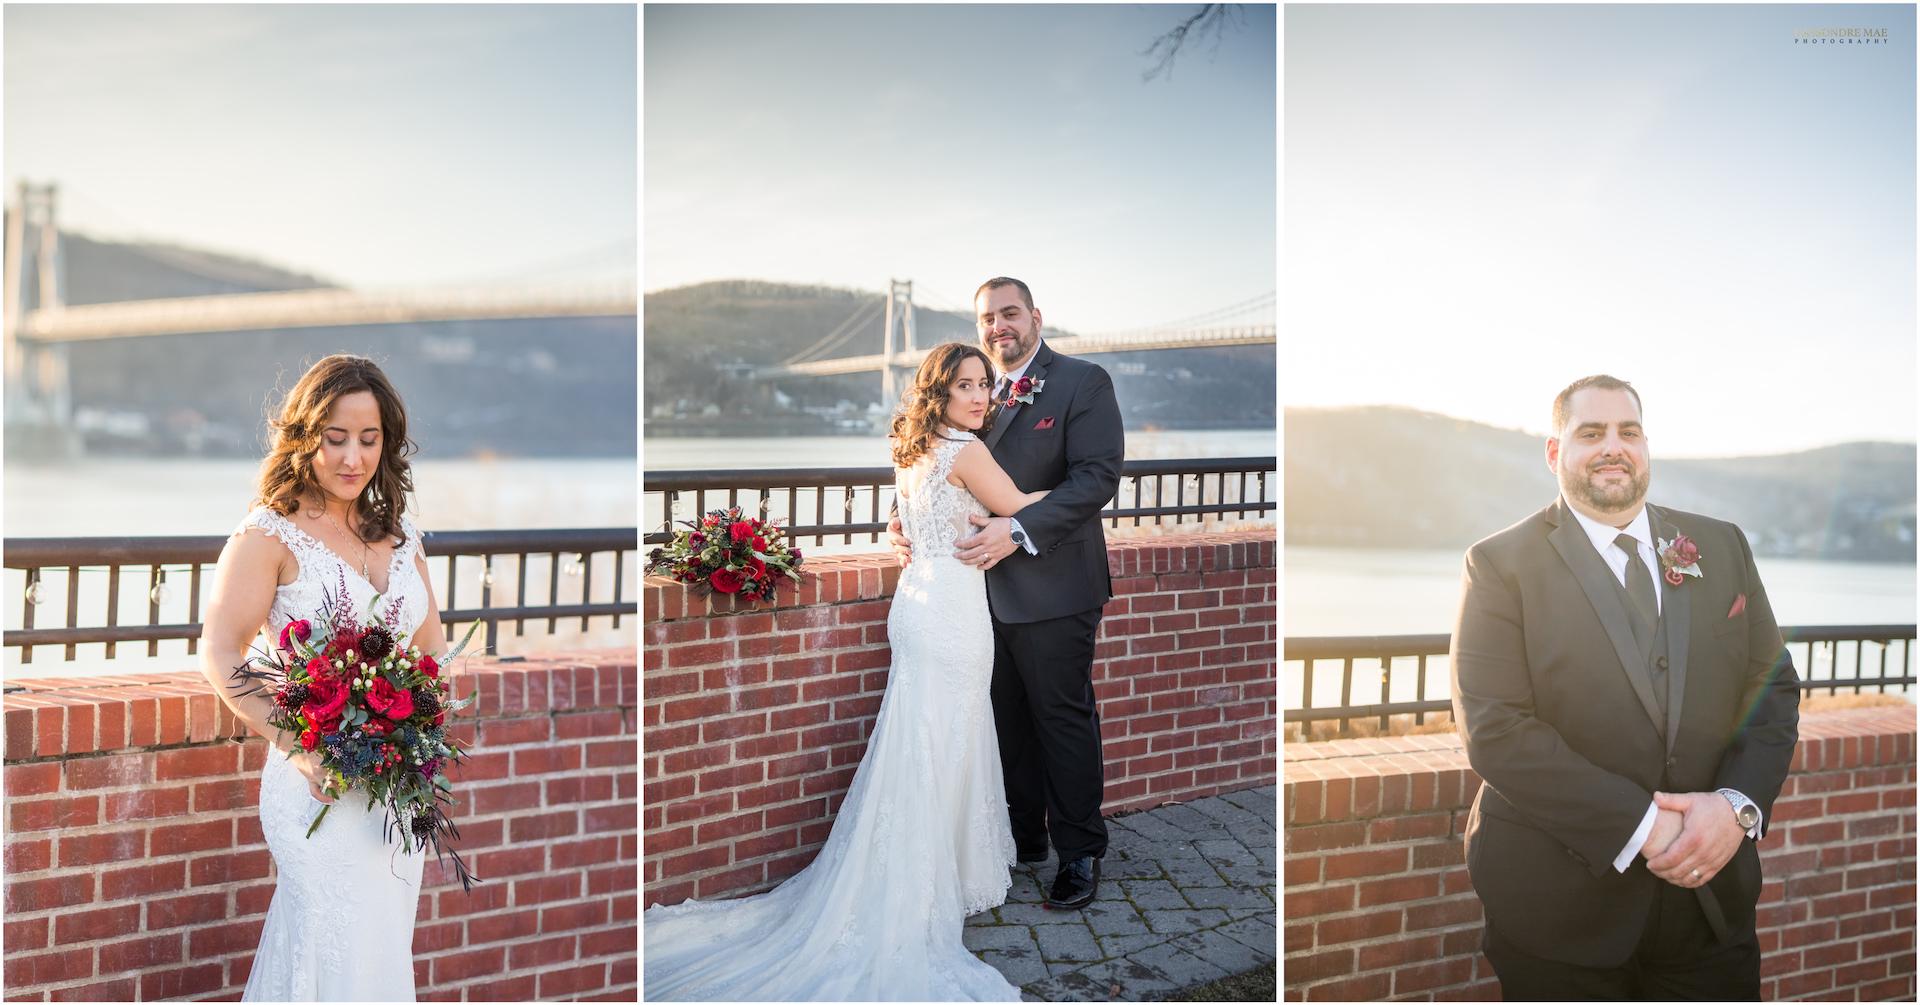 Cassondre Mae Photography The Grandview Weddings 3.jpg